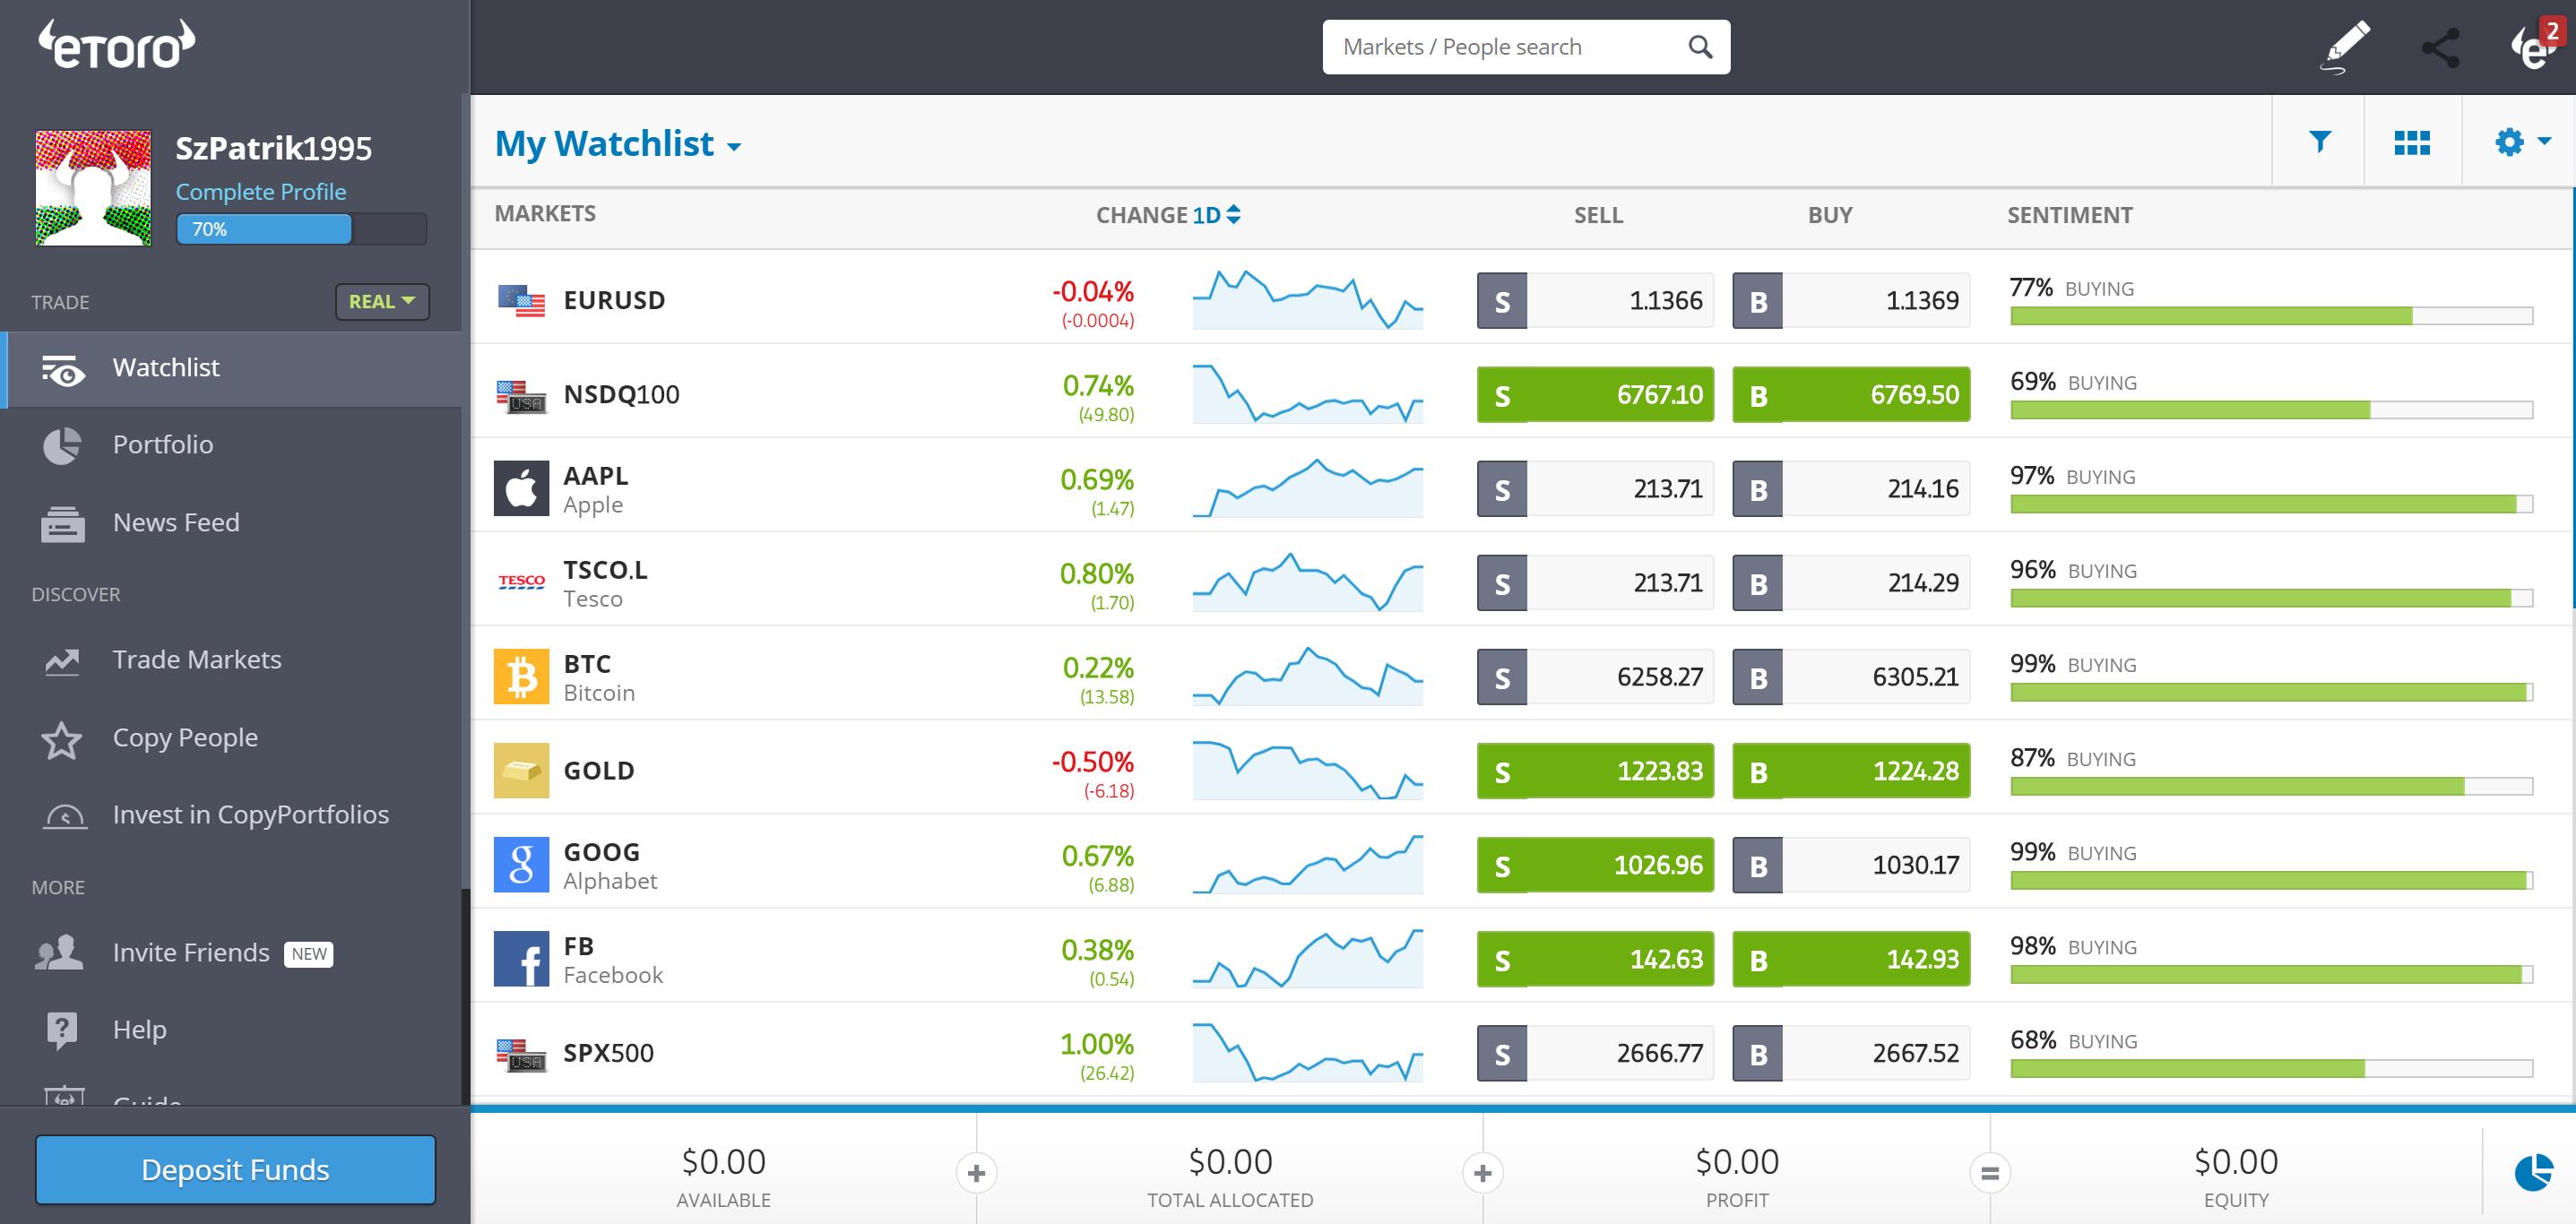 How to buy bitcoin - Etoro - Web trading platform